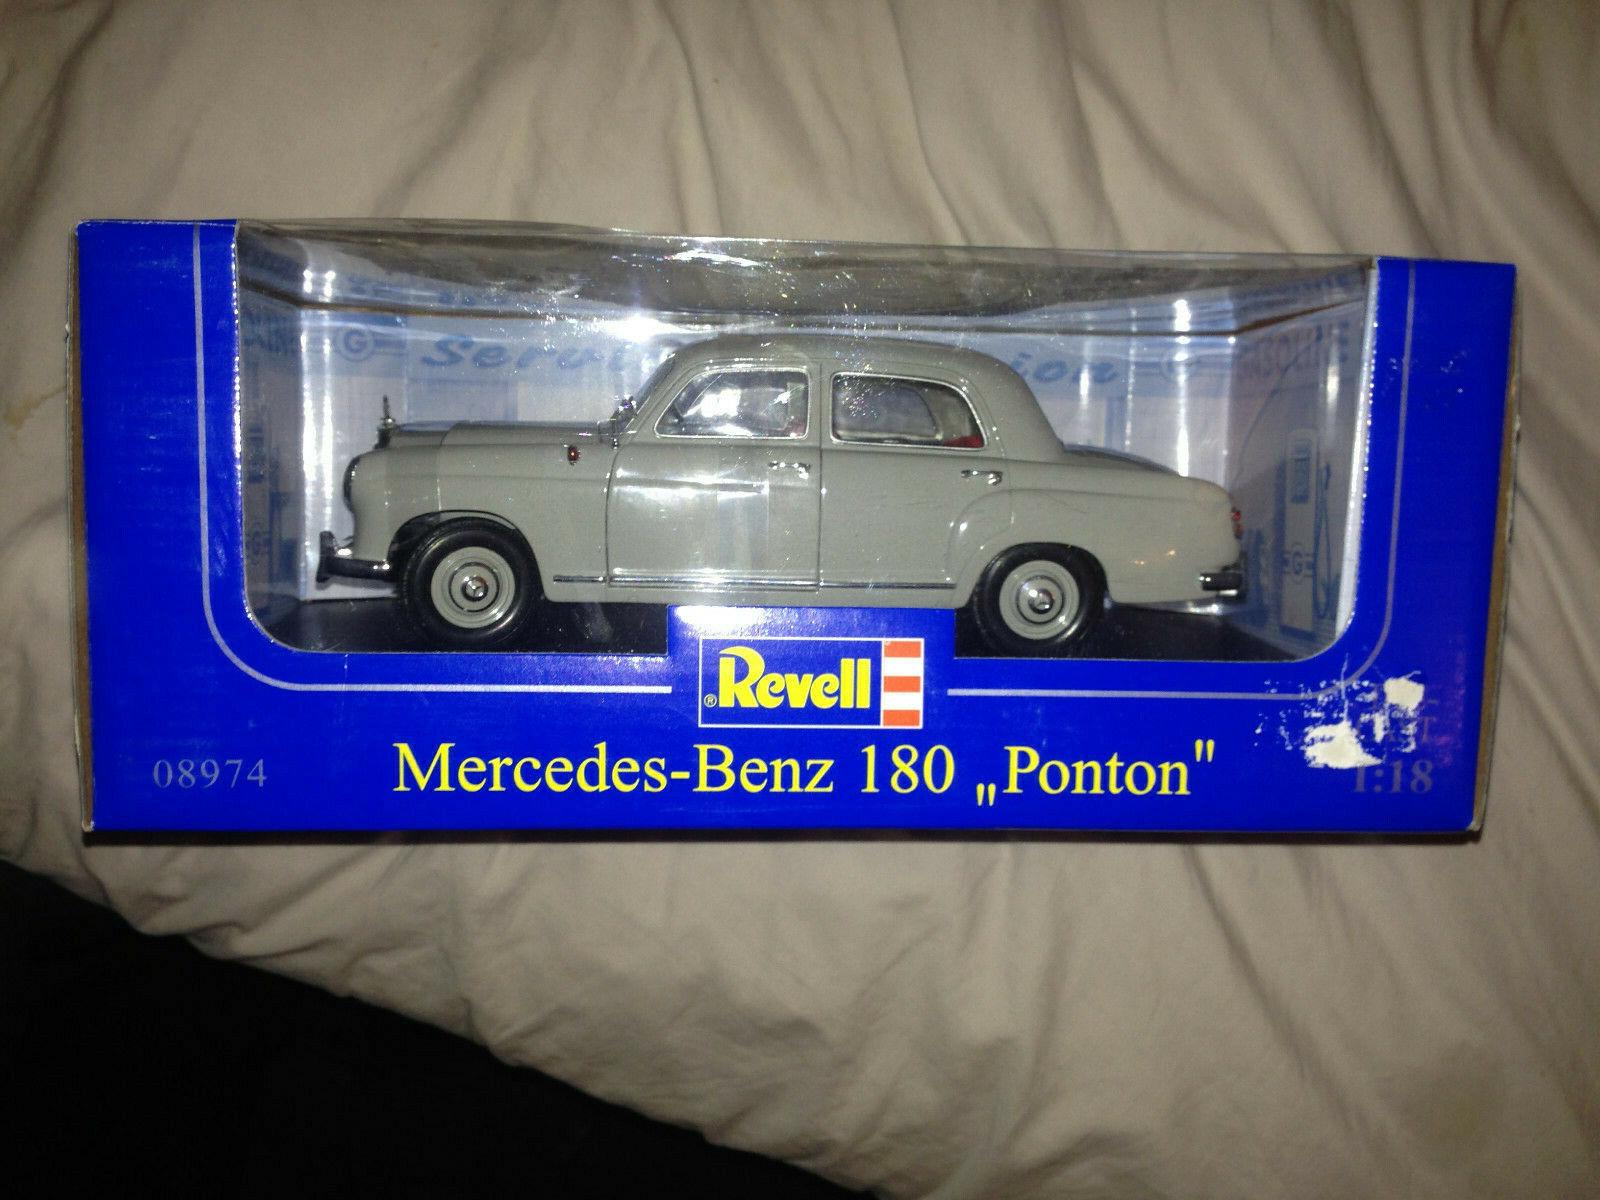 Revell Rarity Mercedes Benz 180 Ponton i grå - MINT & lådaED